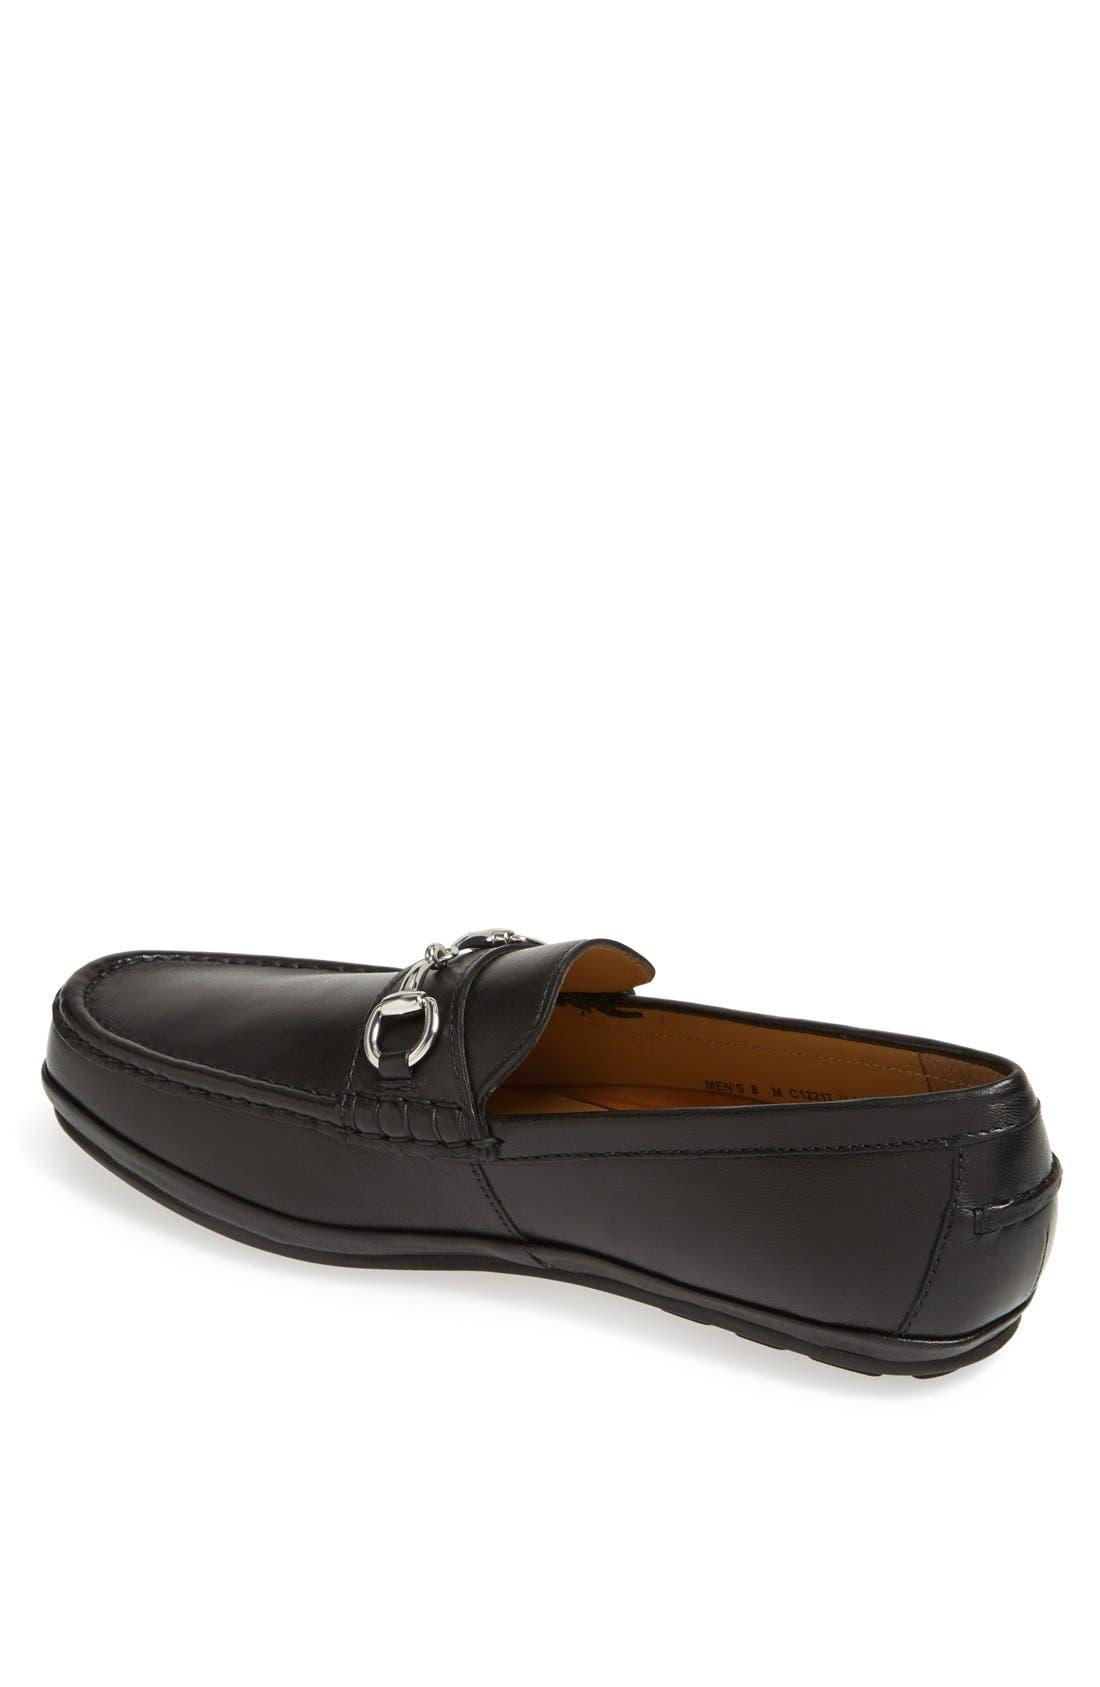 Alternate Image 2  - Cole Haan 'Hudson' Driving Shoe (Men)